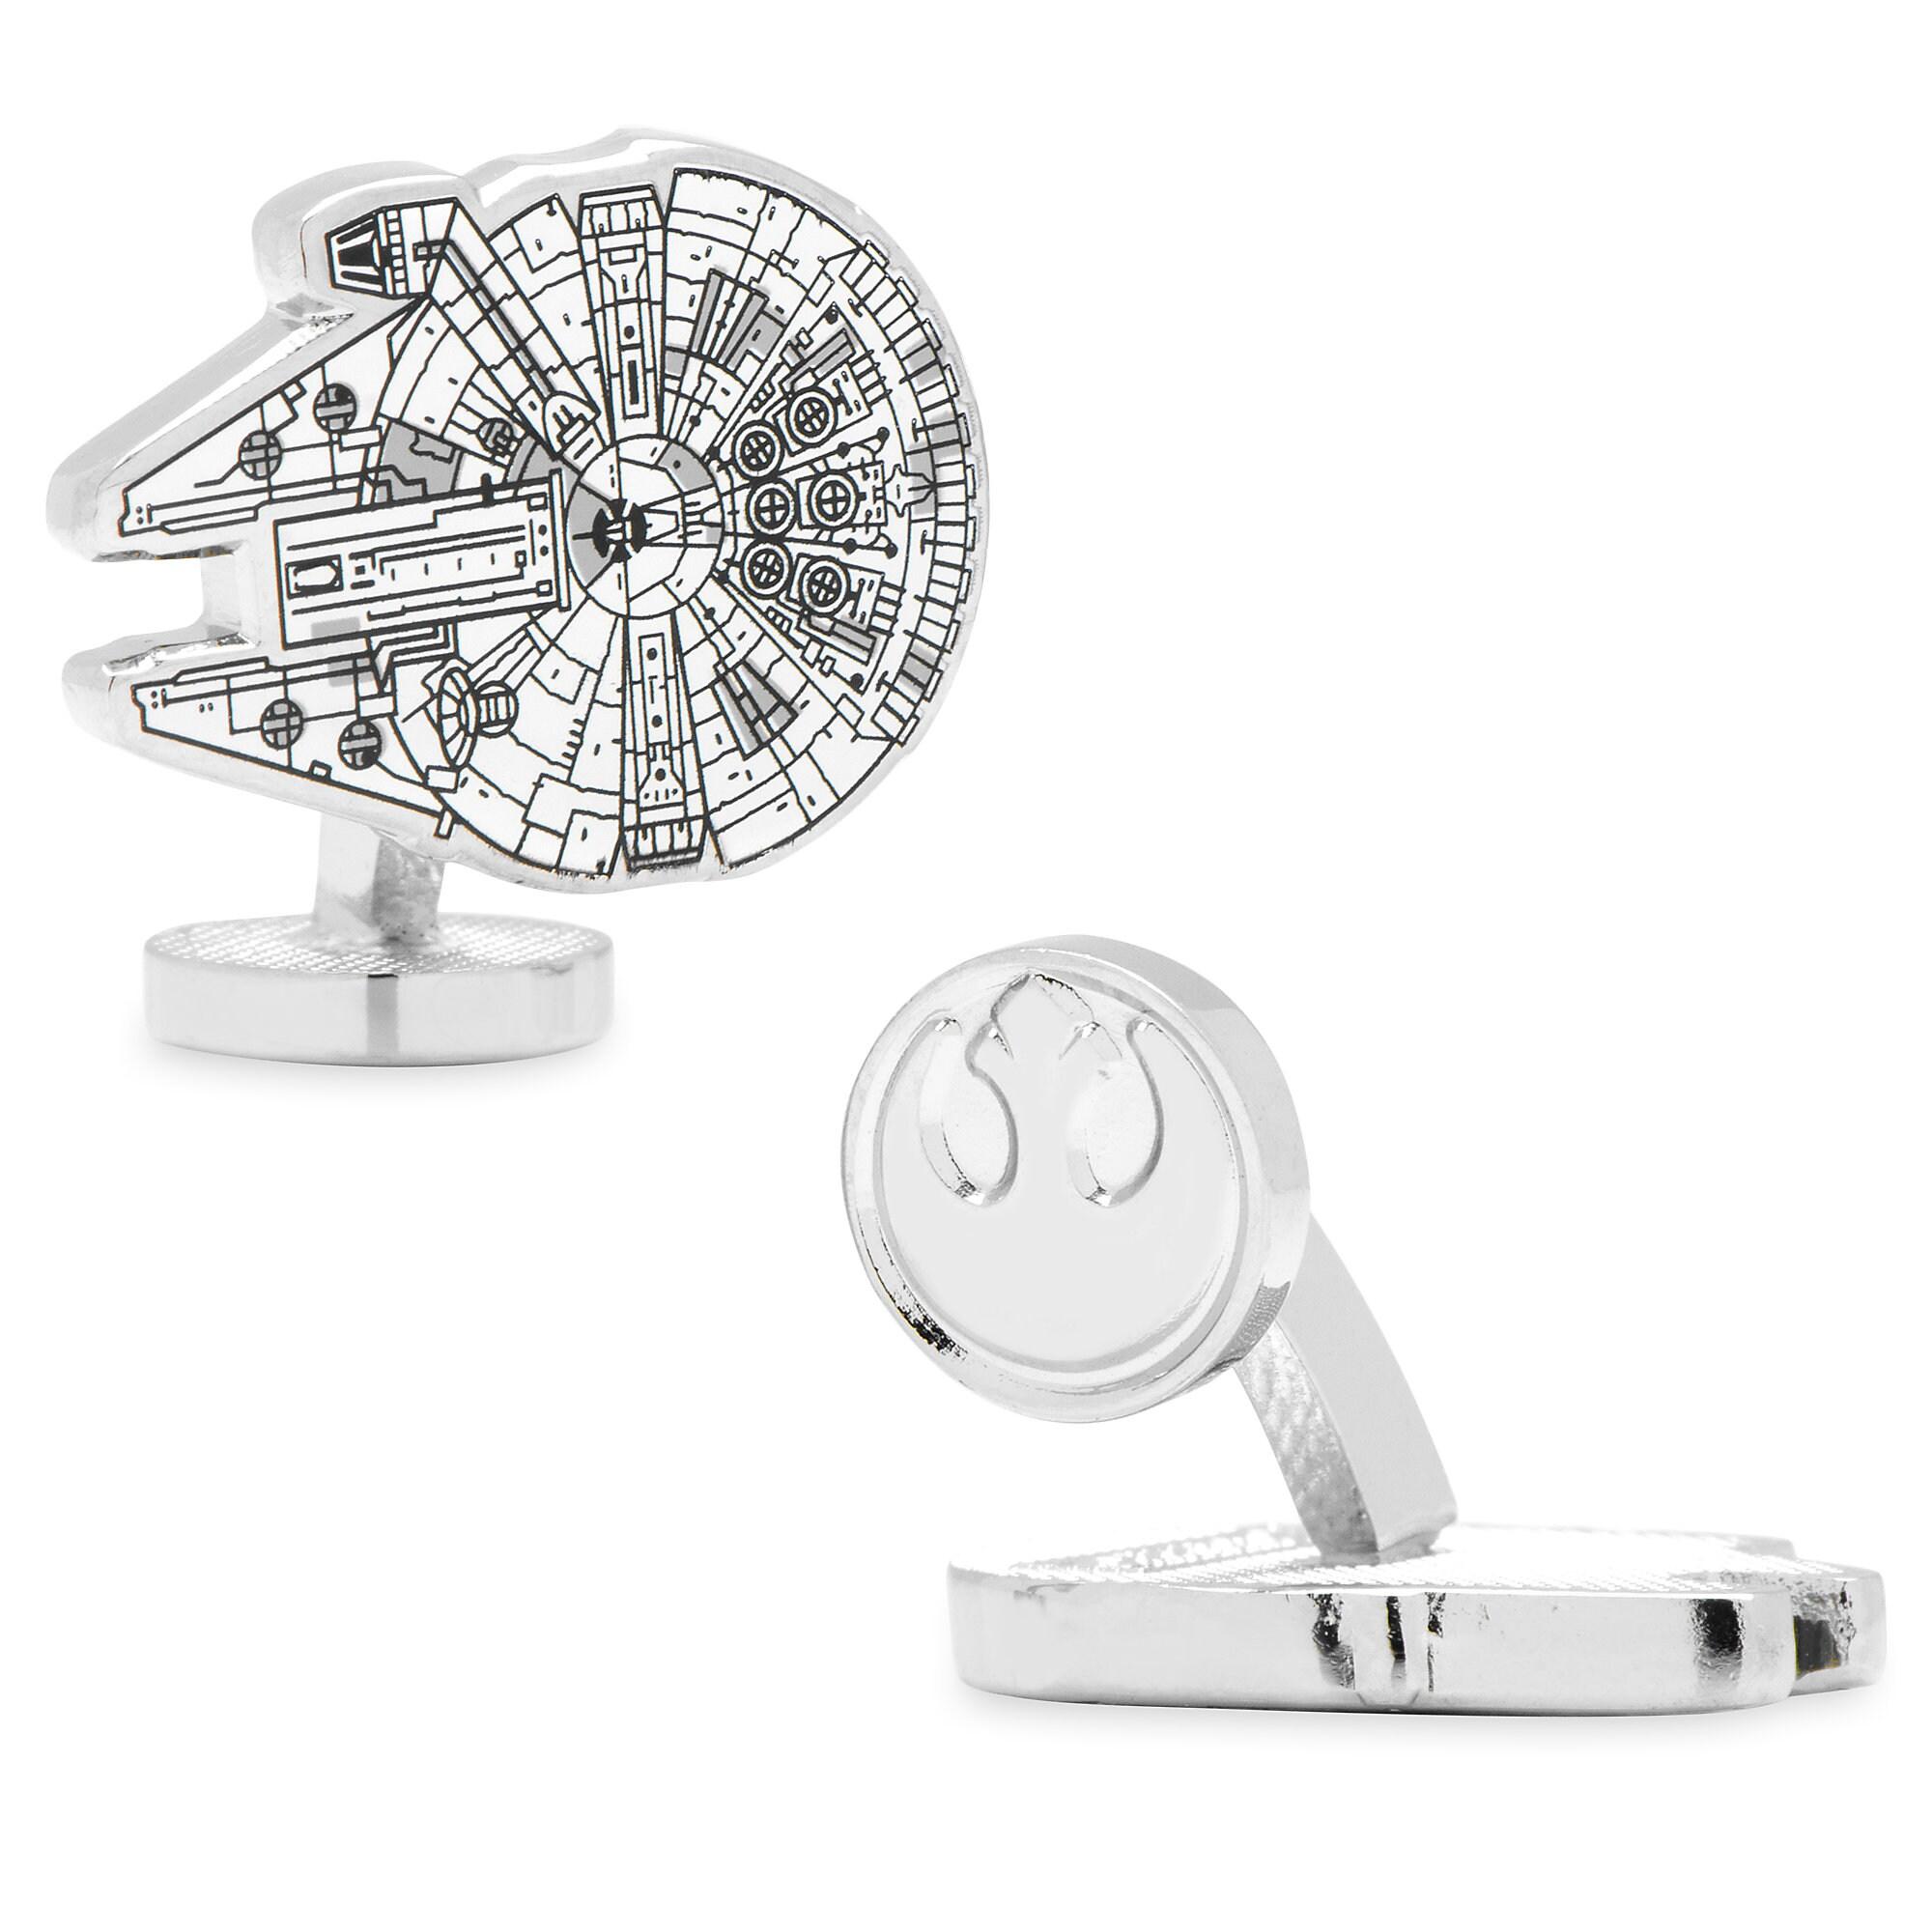 Millennium Falcon Blueprint Cufflinks - Star Wars